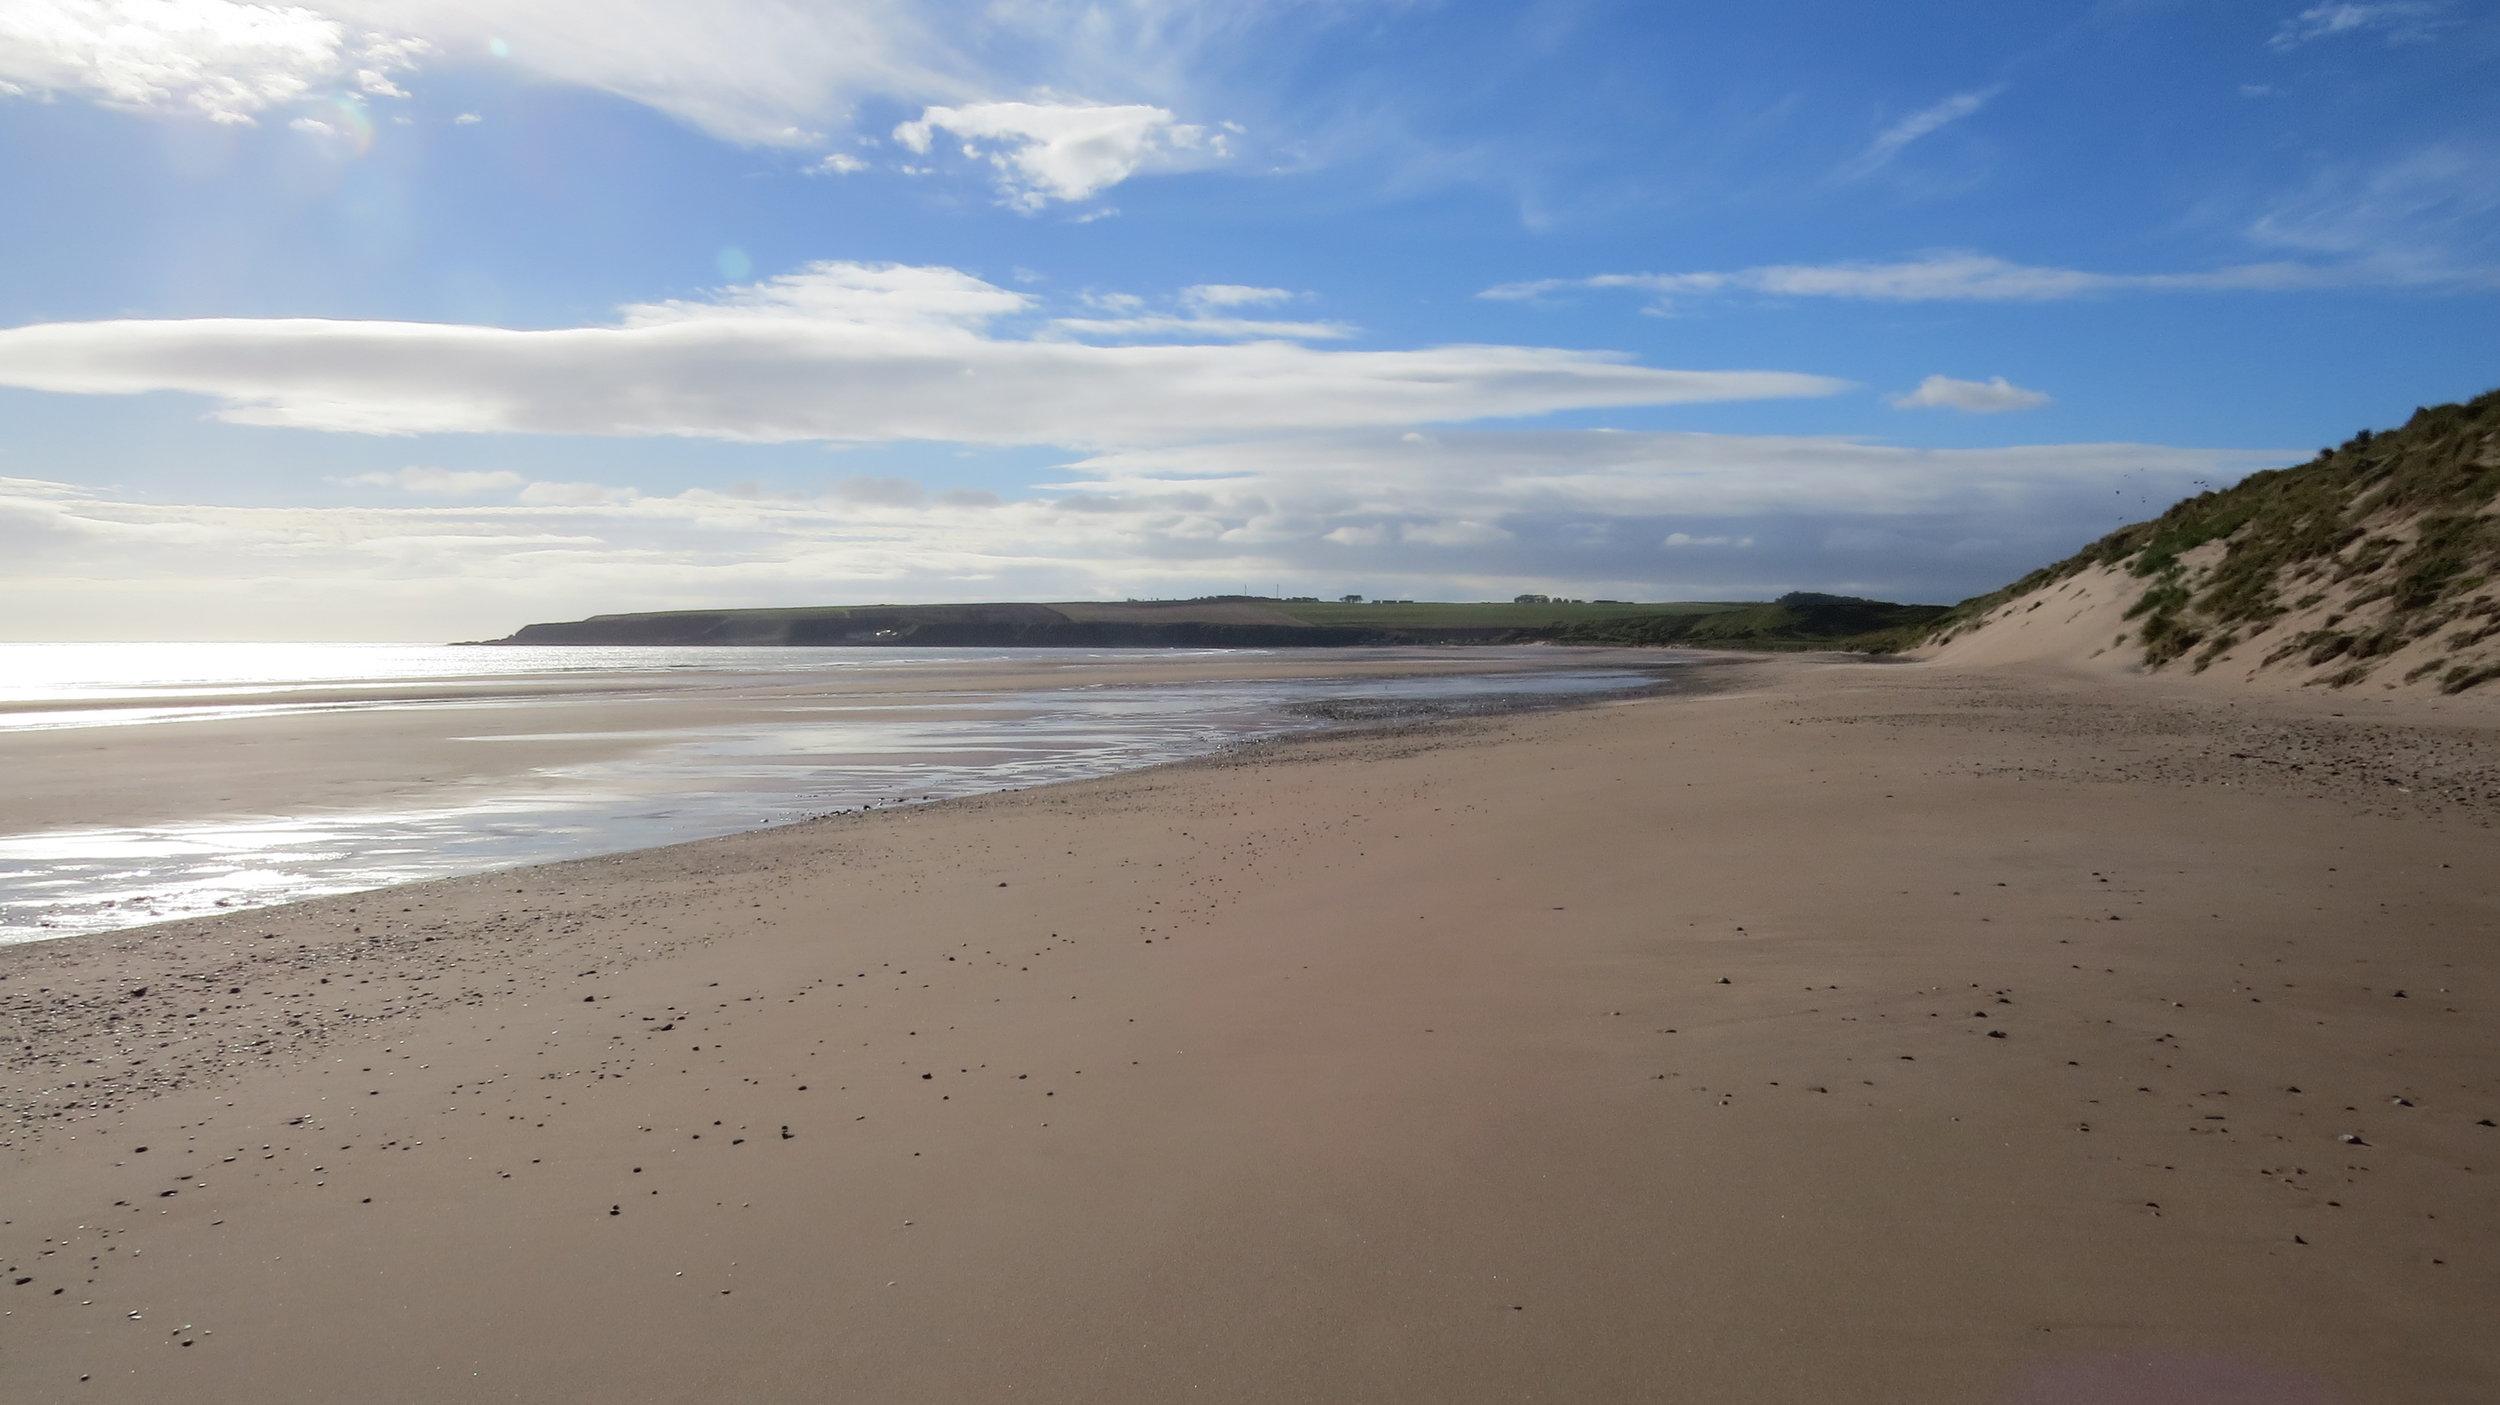 Lunan Sands